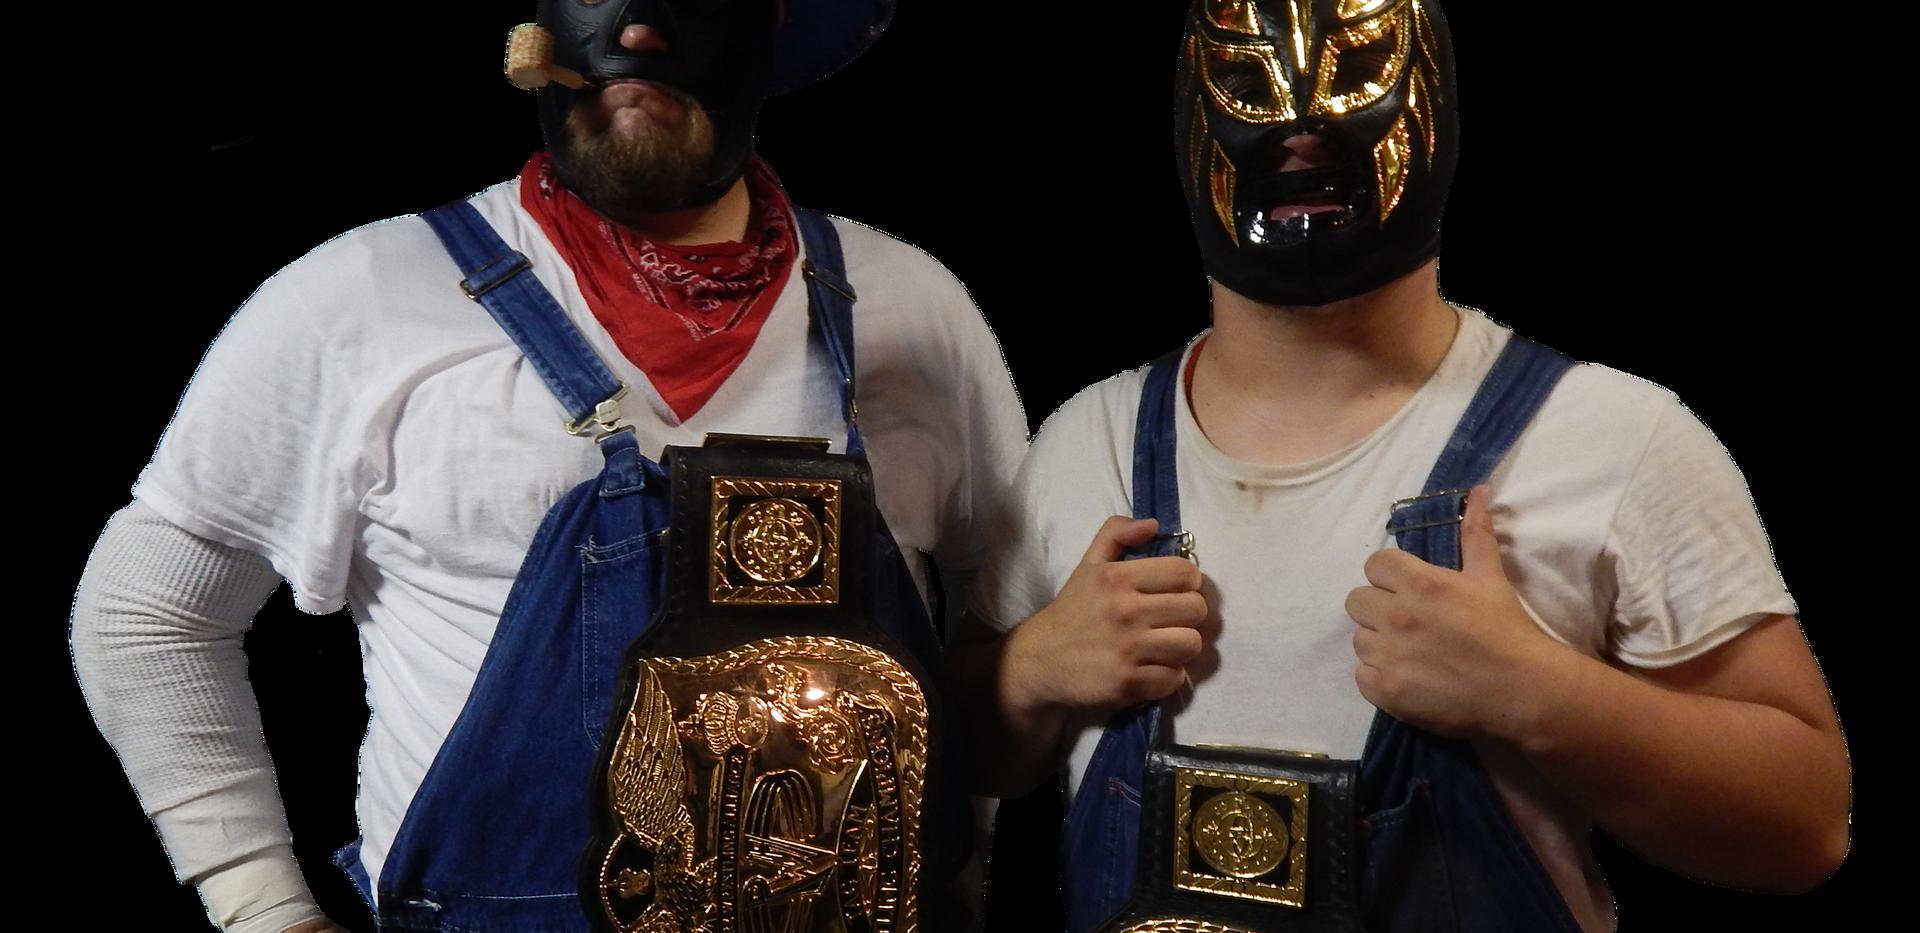 The Hillbillies (Juan & John D.)